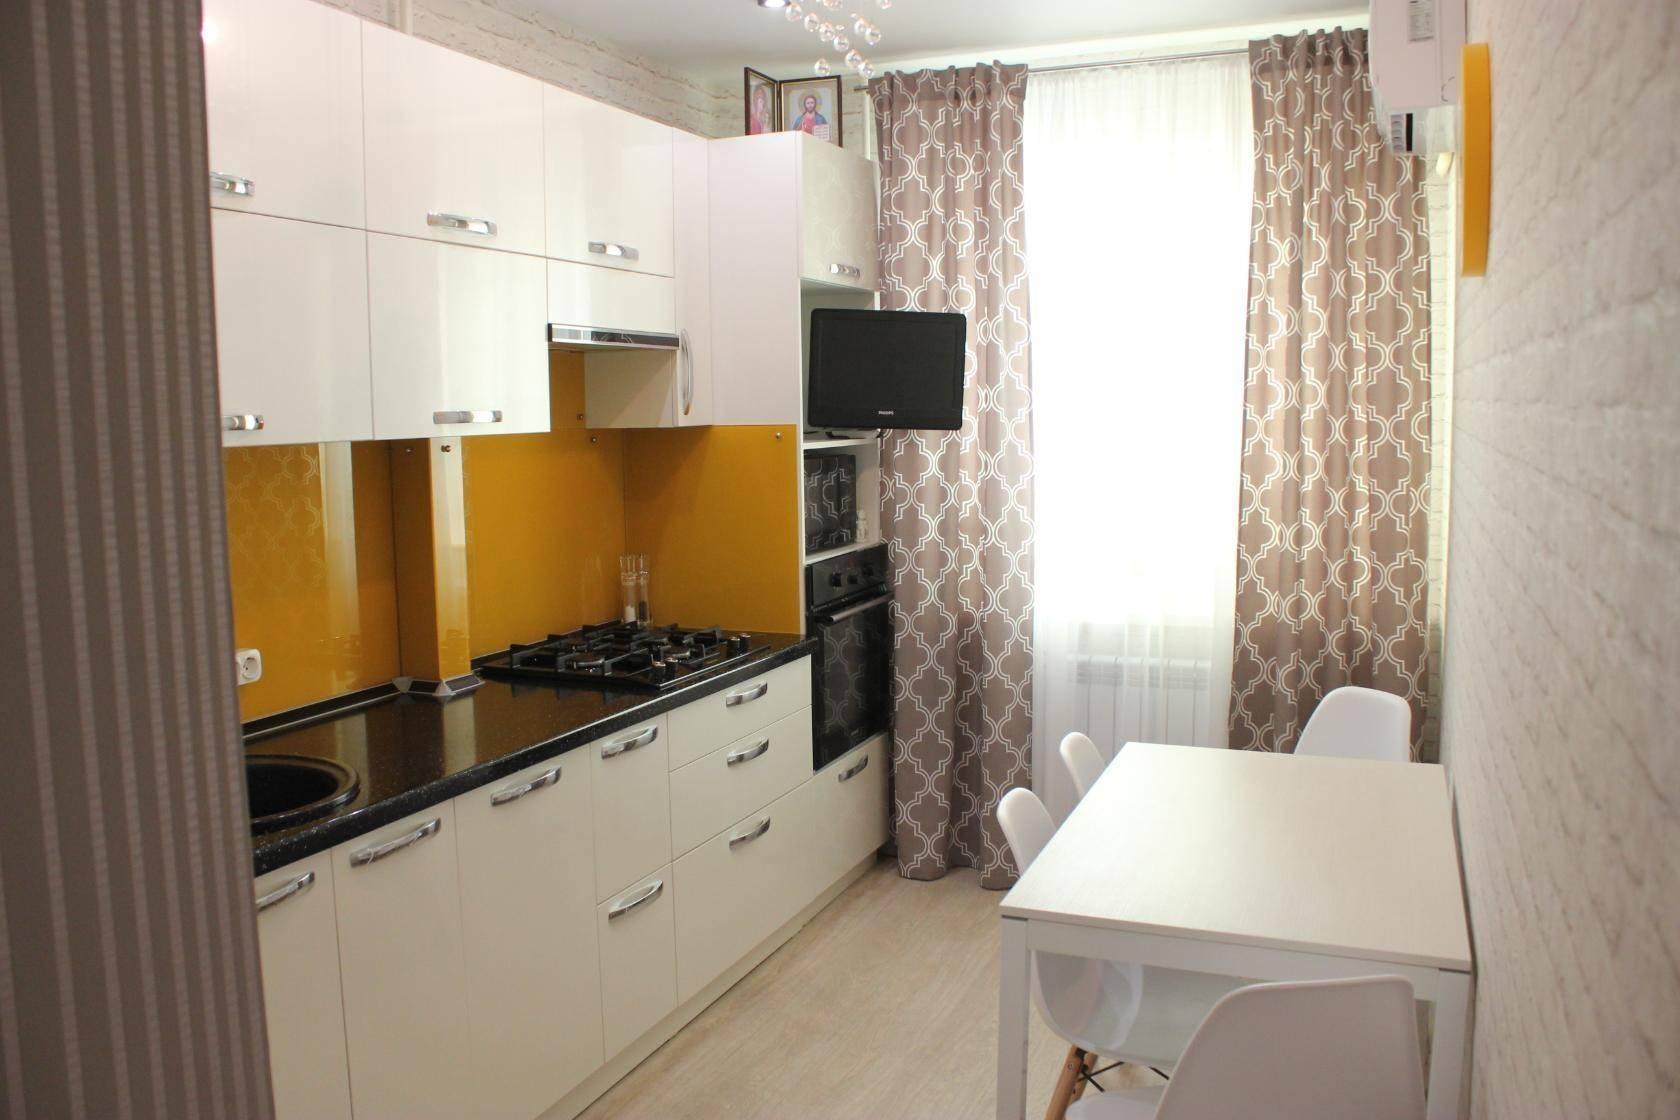 Дизайн кухни 9 кв м – 62 фото-идеи и гид по обустройству